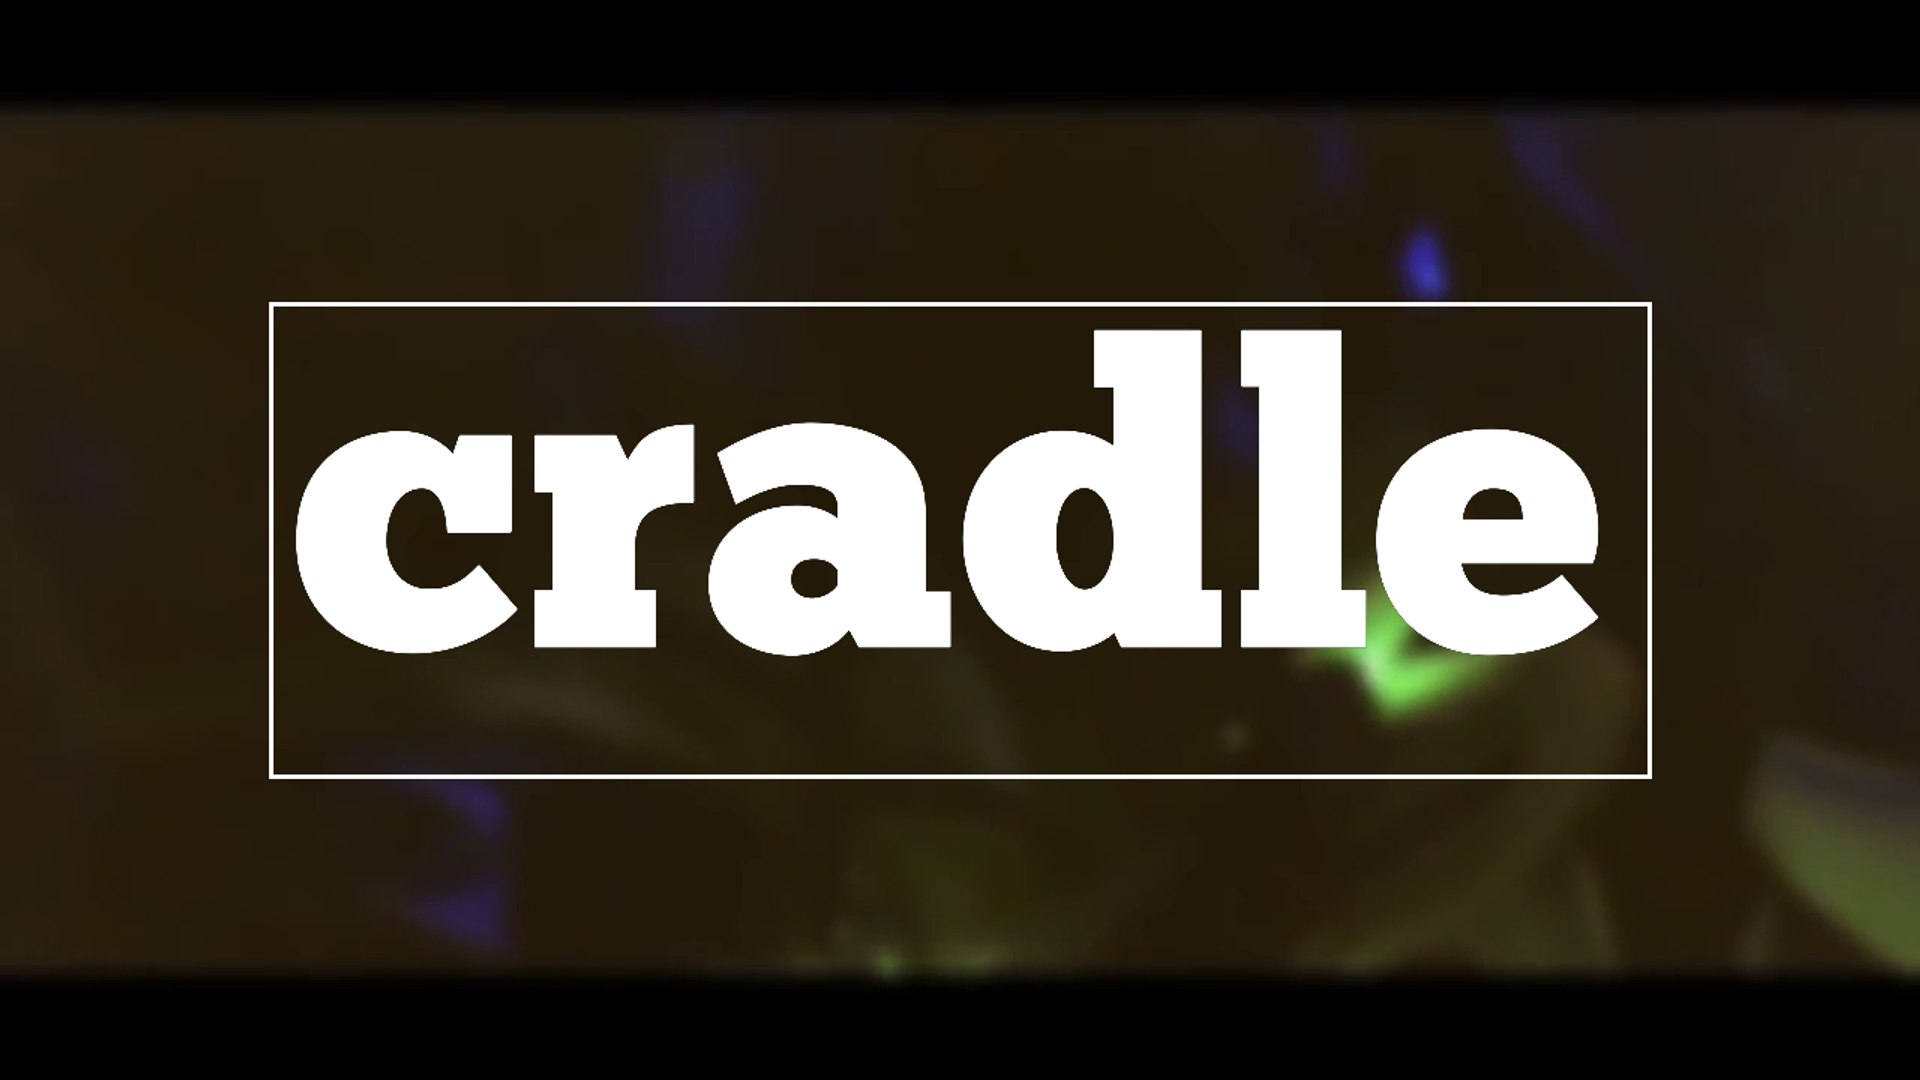 cradle spelling and pronunciation